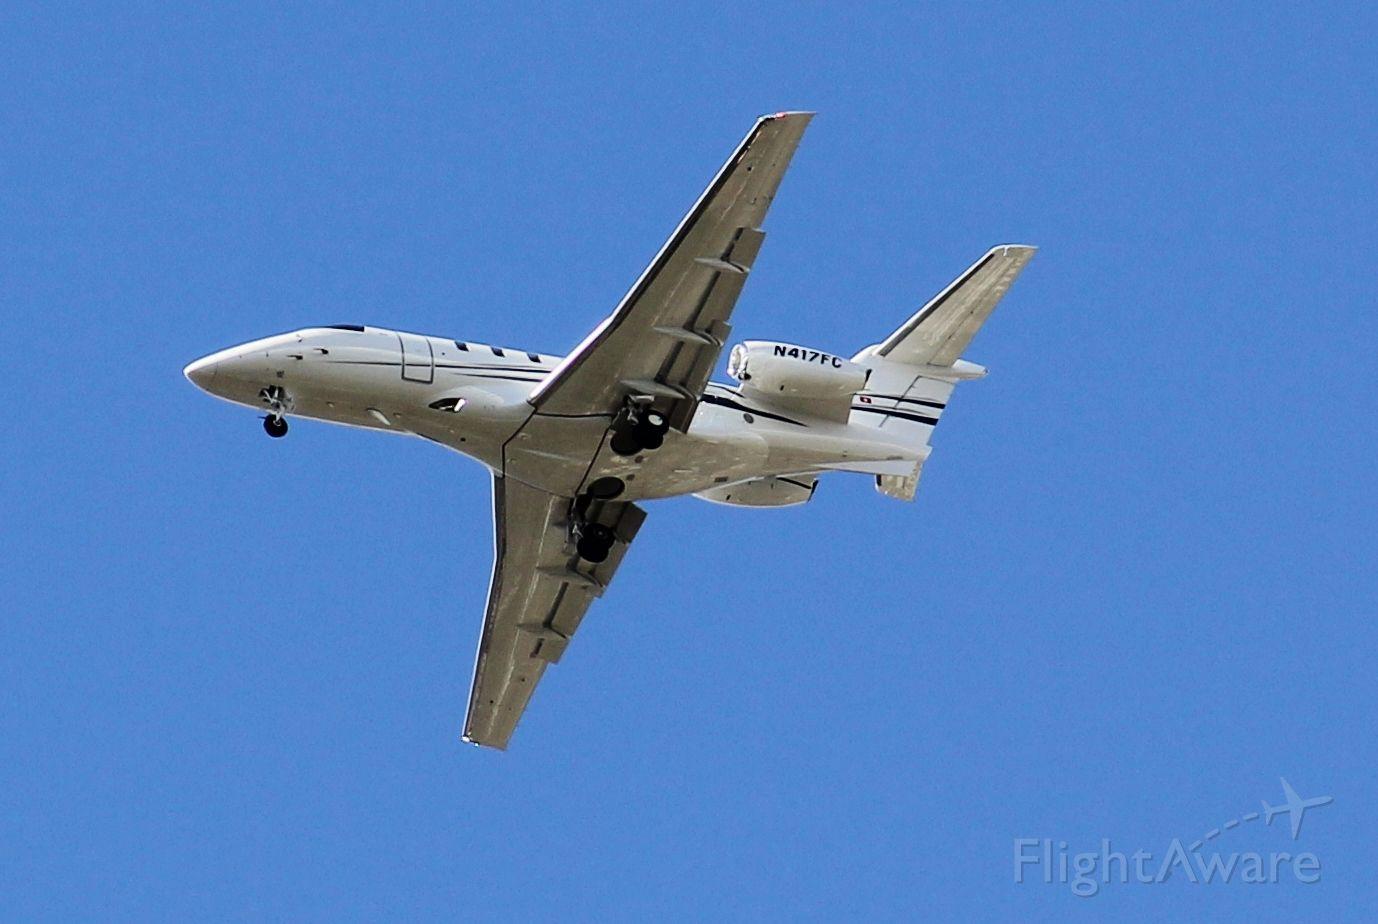 Pilatus PC-24 (N417FC) - Wheels down, making final approach to Orlando International. MCO<br />Clear skies, runway in sight.